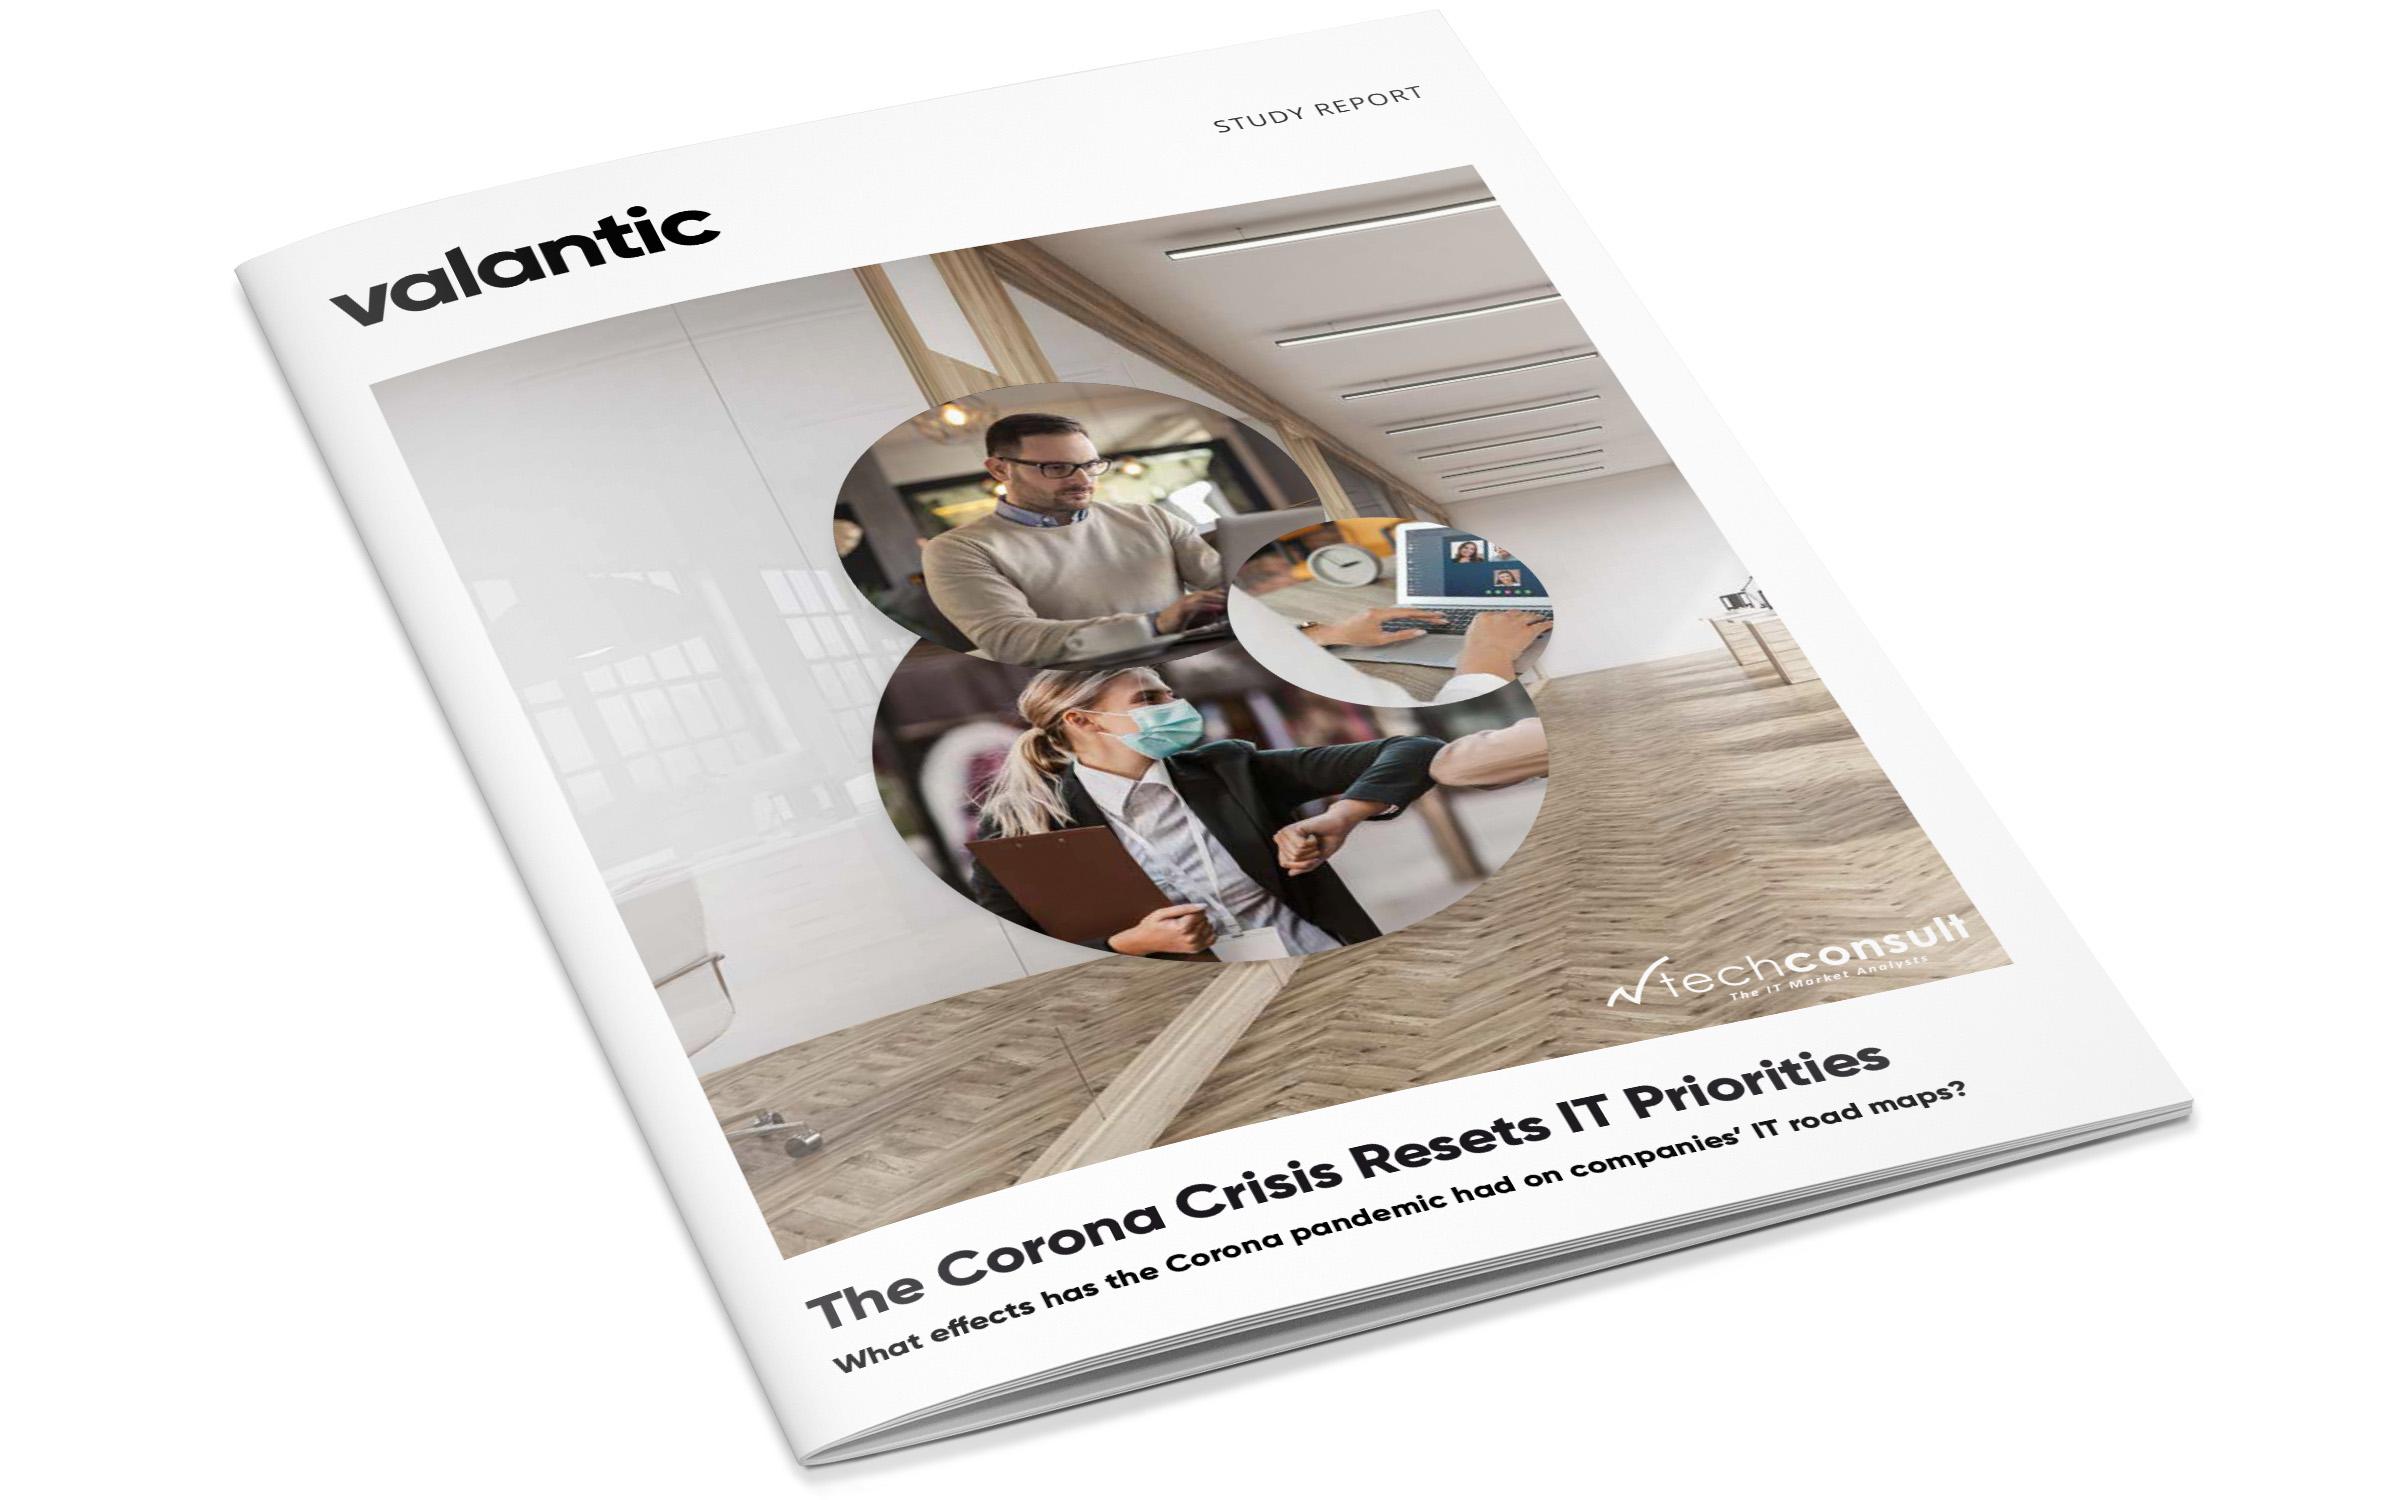 valantic-study-report-corona-crisis-resets-it-priorities